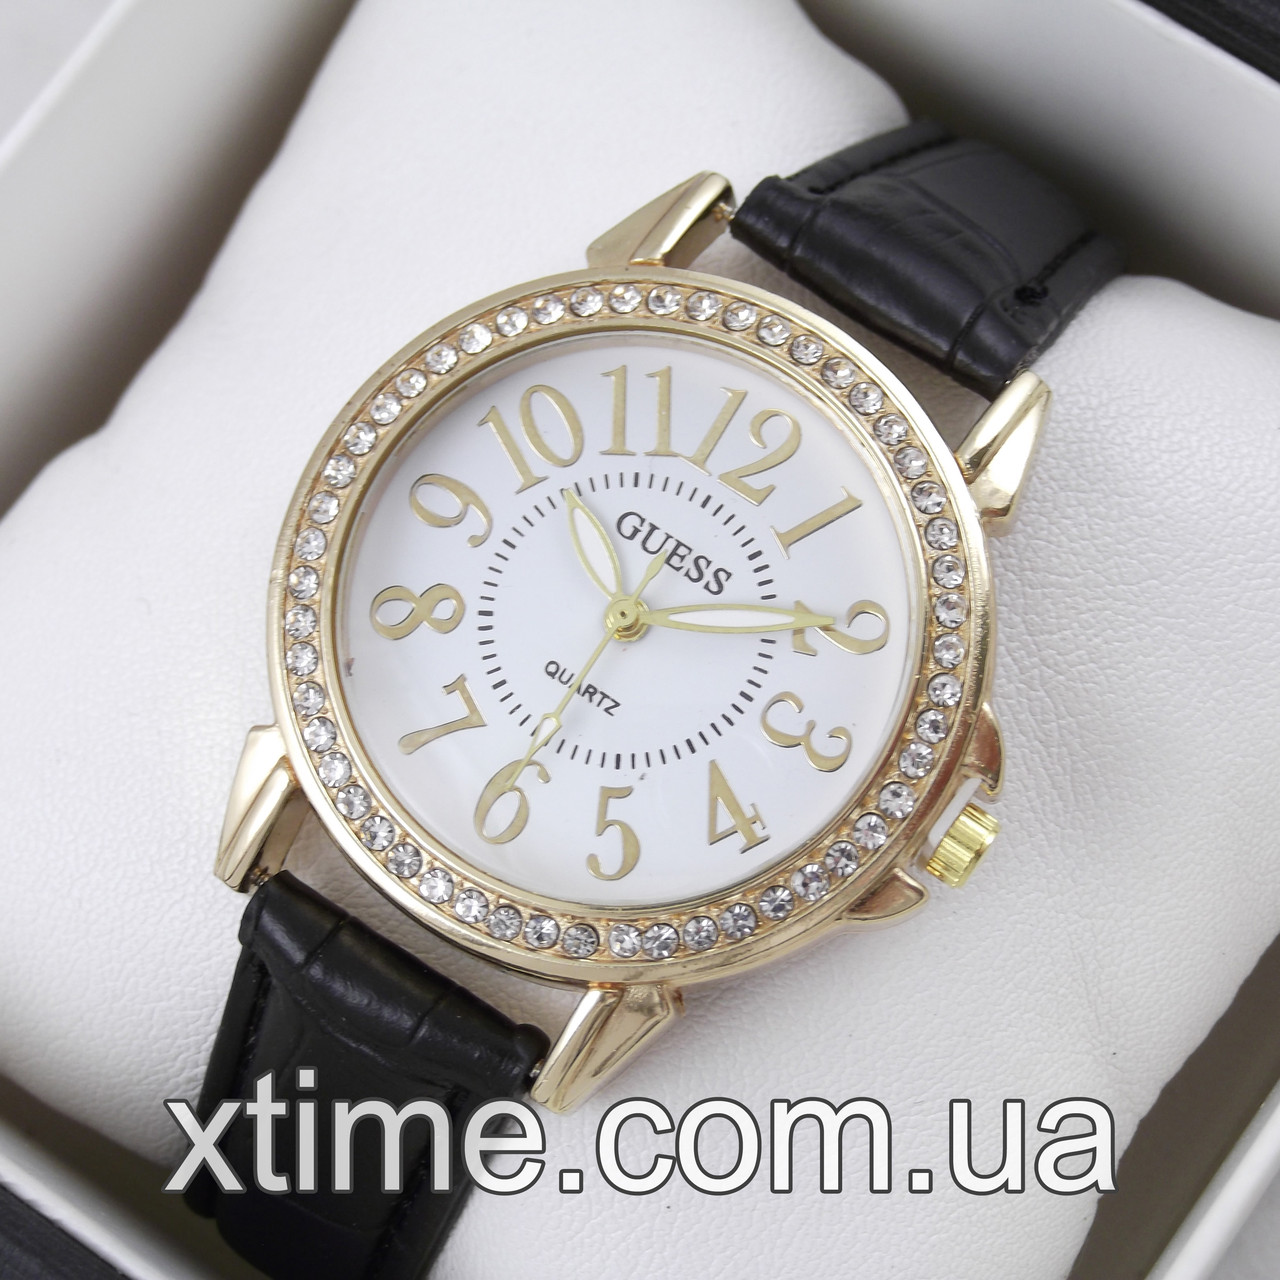 ba82d68b Женские наручные часы Guess M89, цена 255 грн., купить Харків — Prom ...